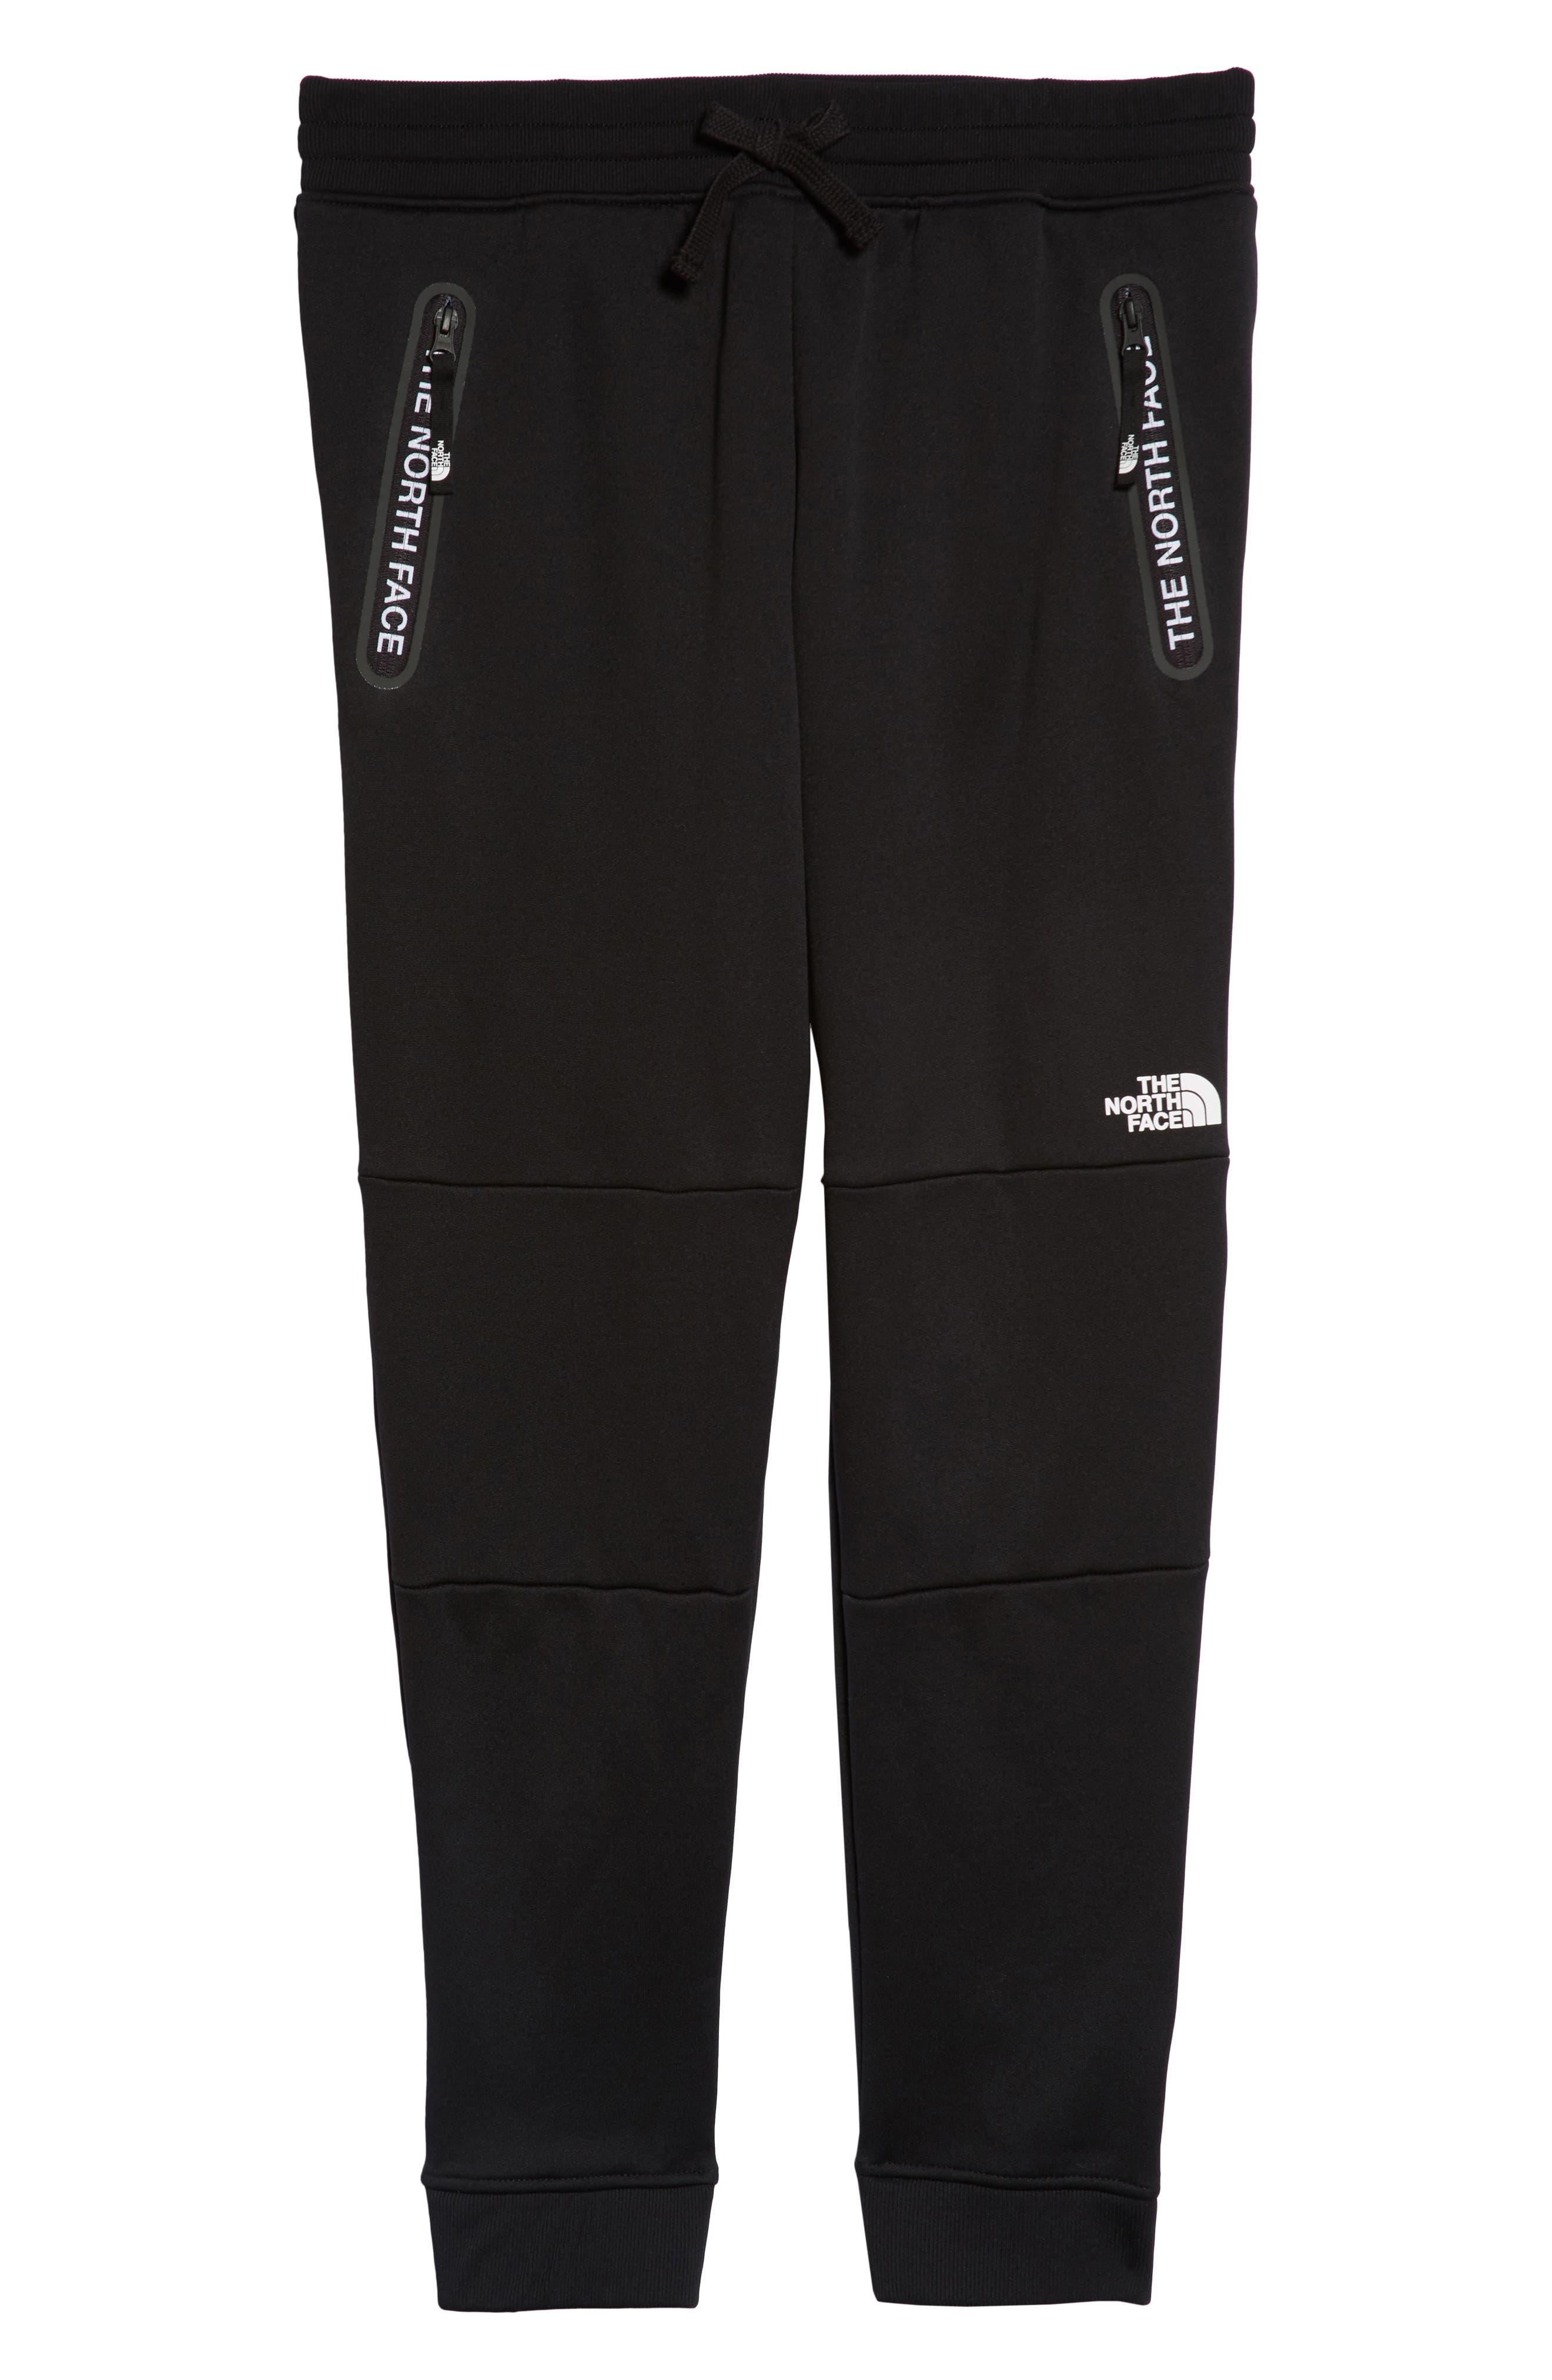 Mount Modern Jogger Pants,                             Alternate thumbnail 6, color,                             Tnf Black